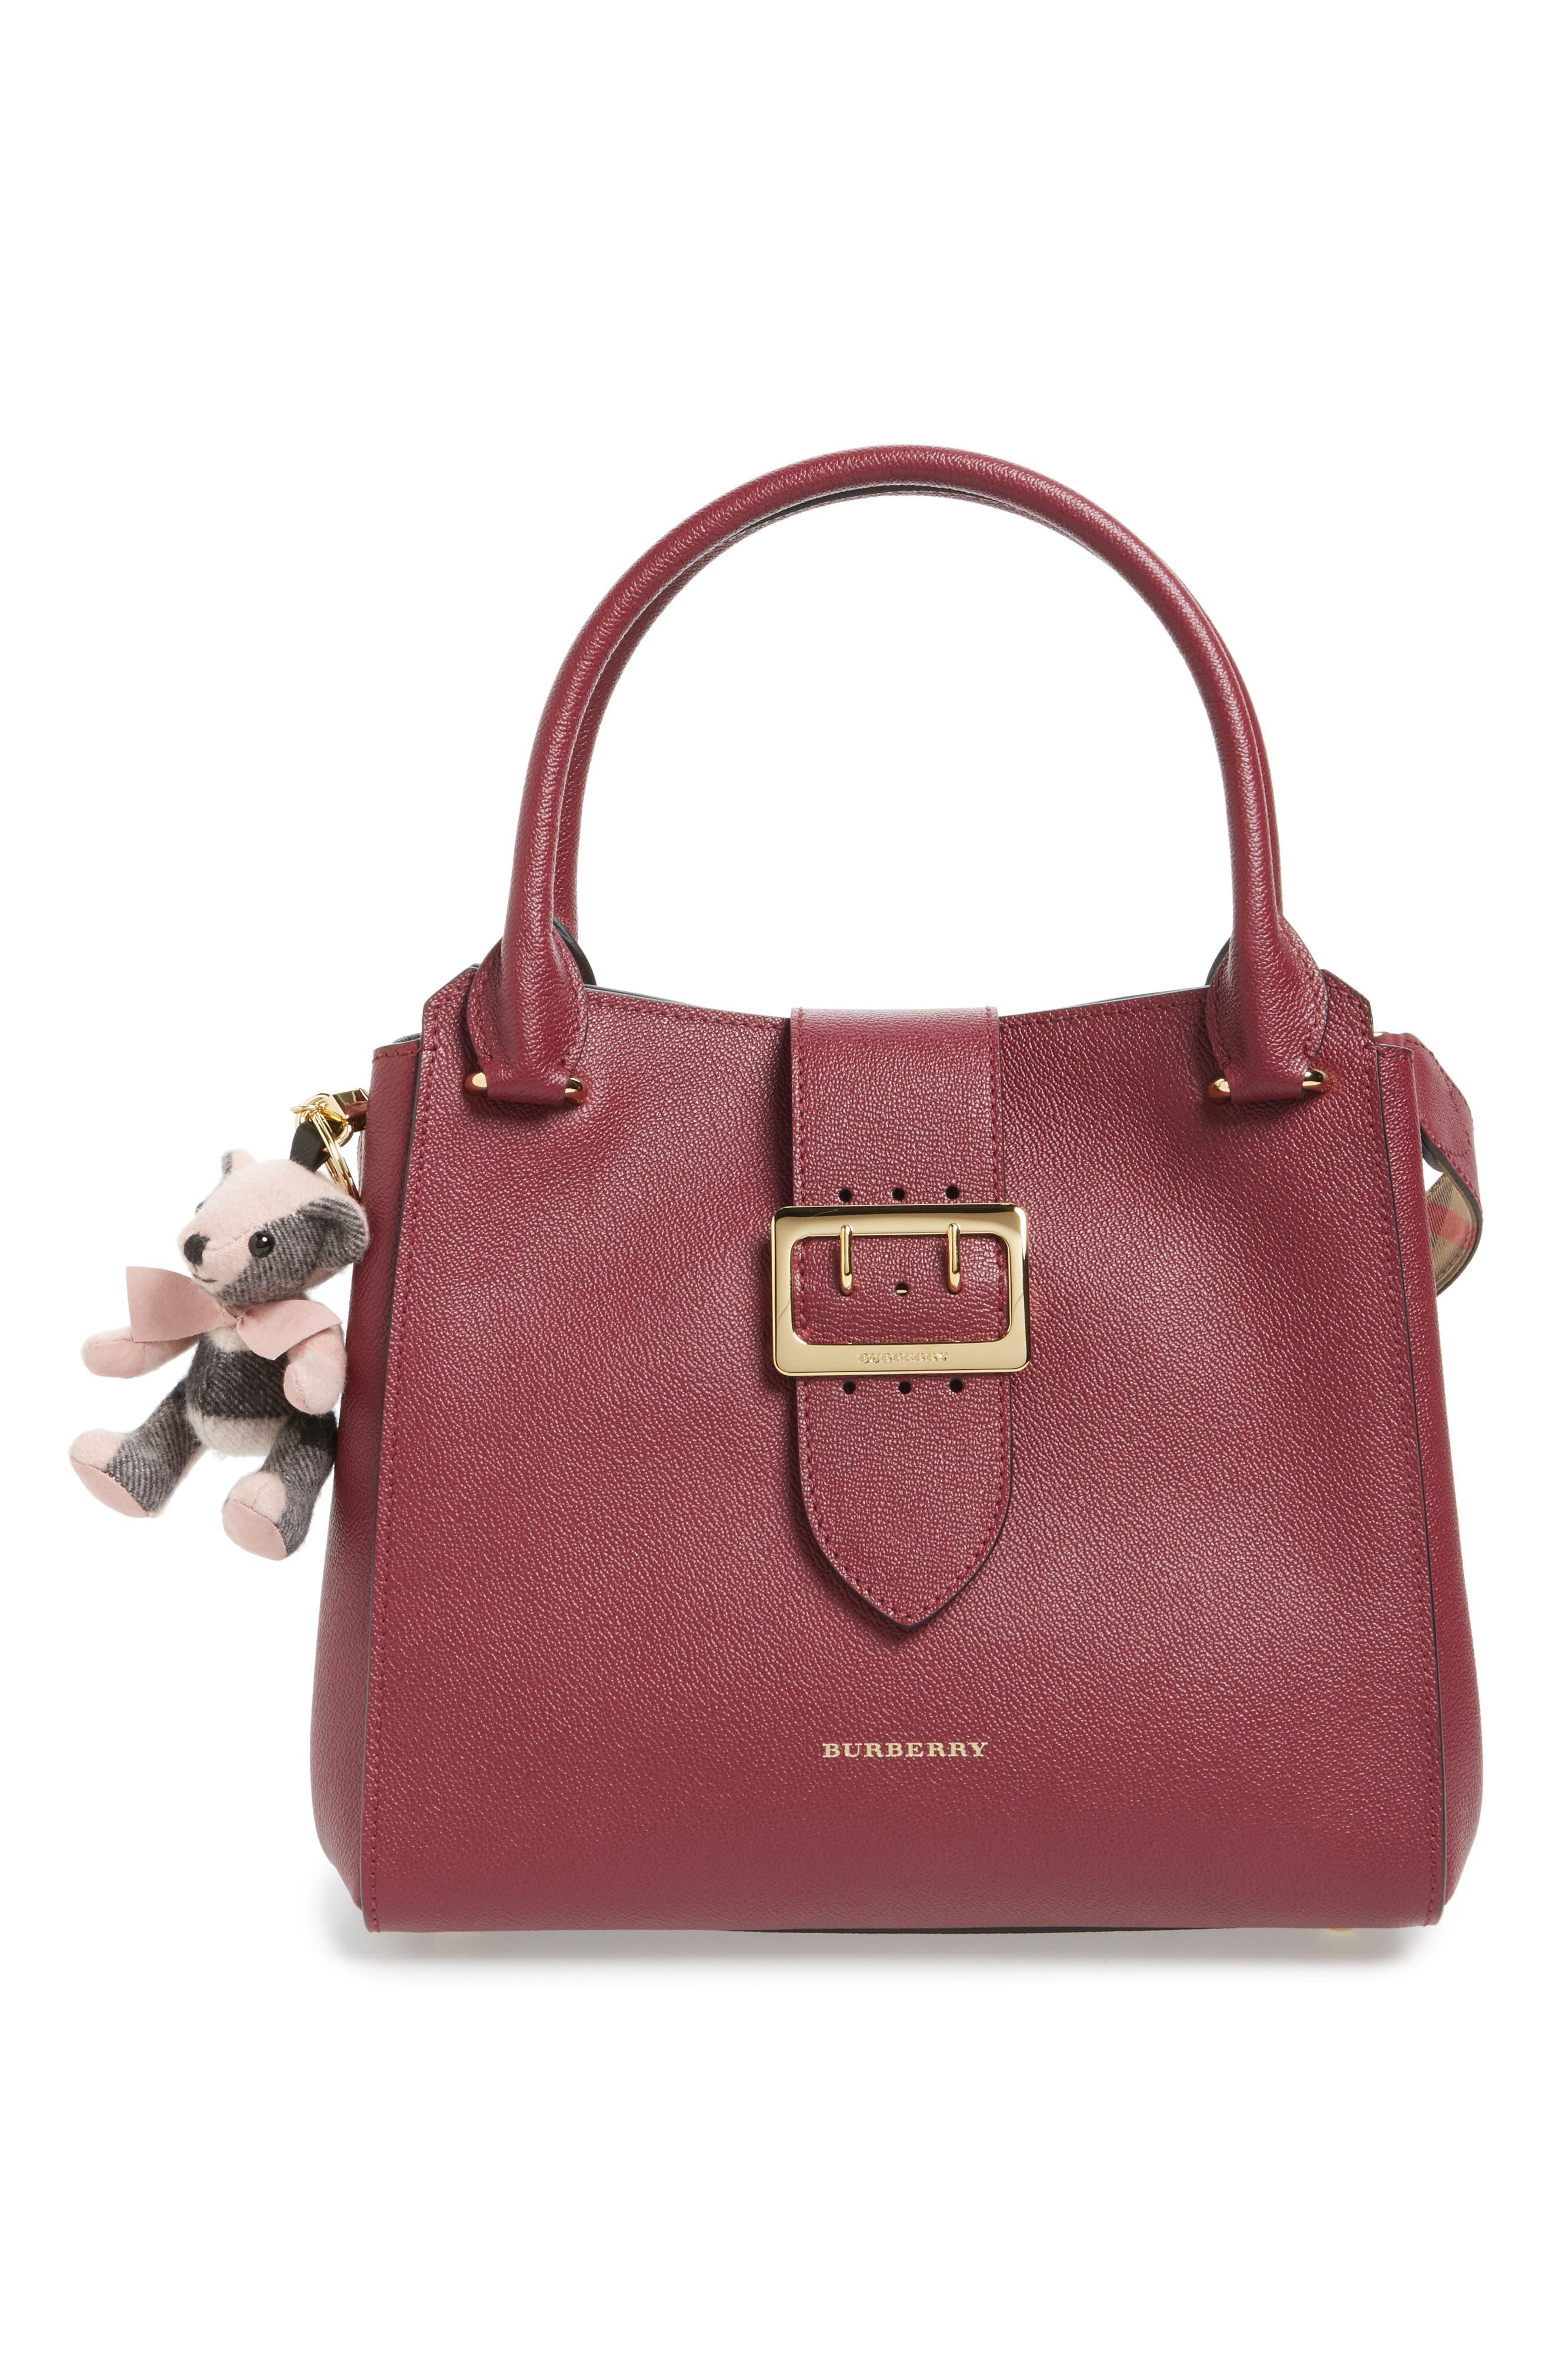 'Thomas' Check Bear Cashmere Bag Charm,                             Alternate thumbnail 2, color,                             650